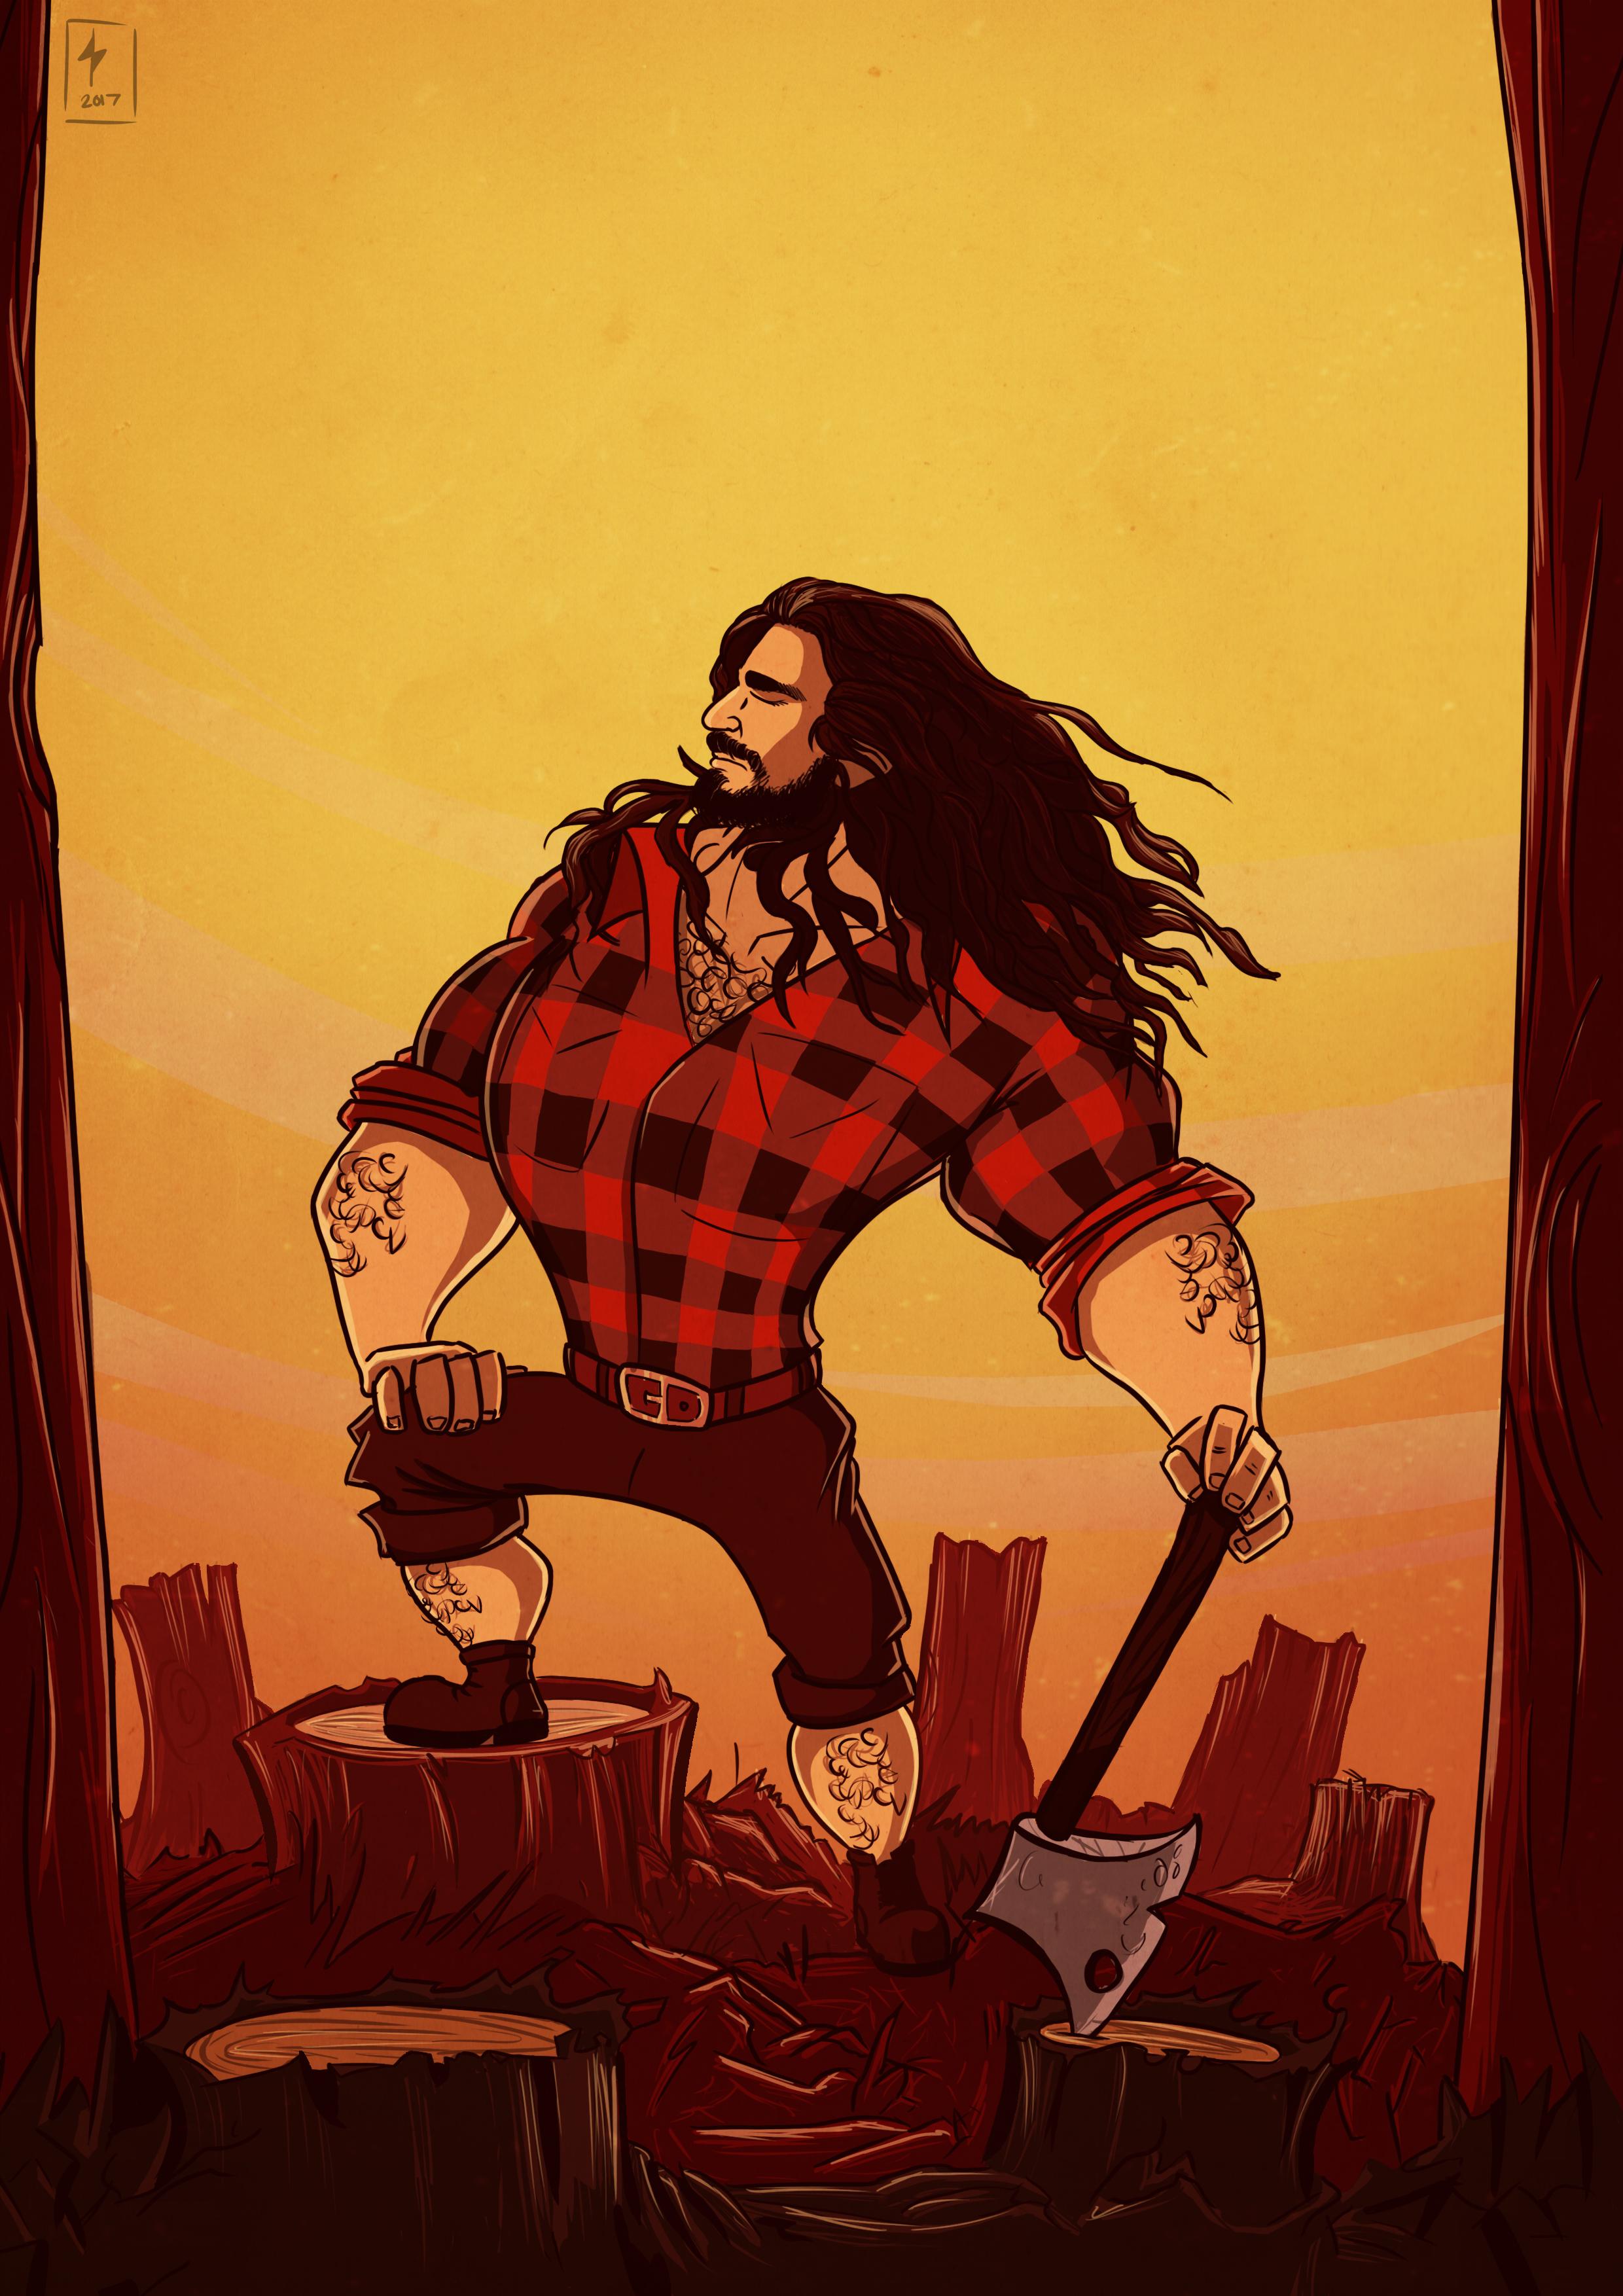 Majestic Lumberjack